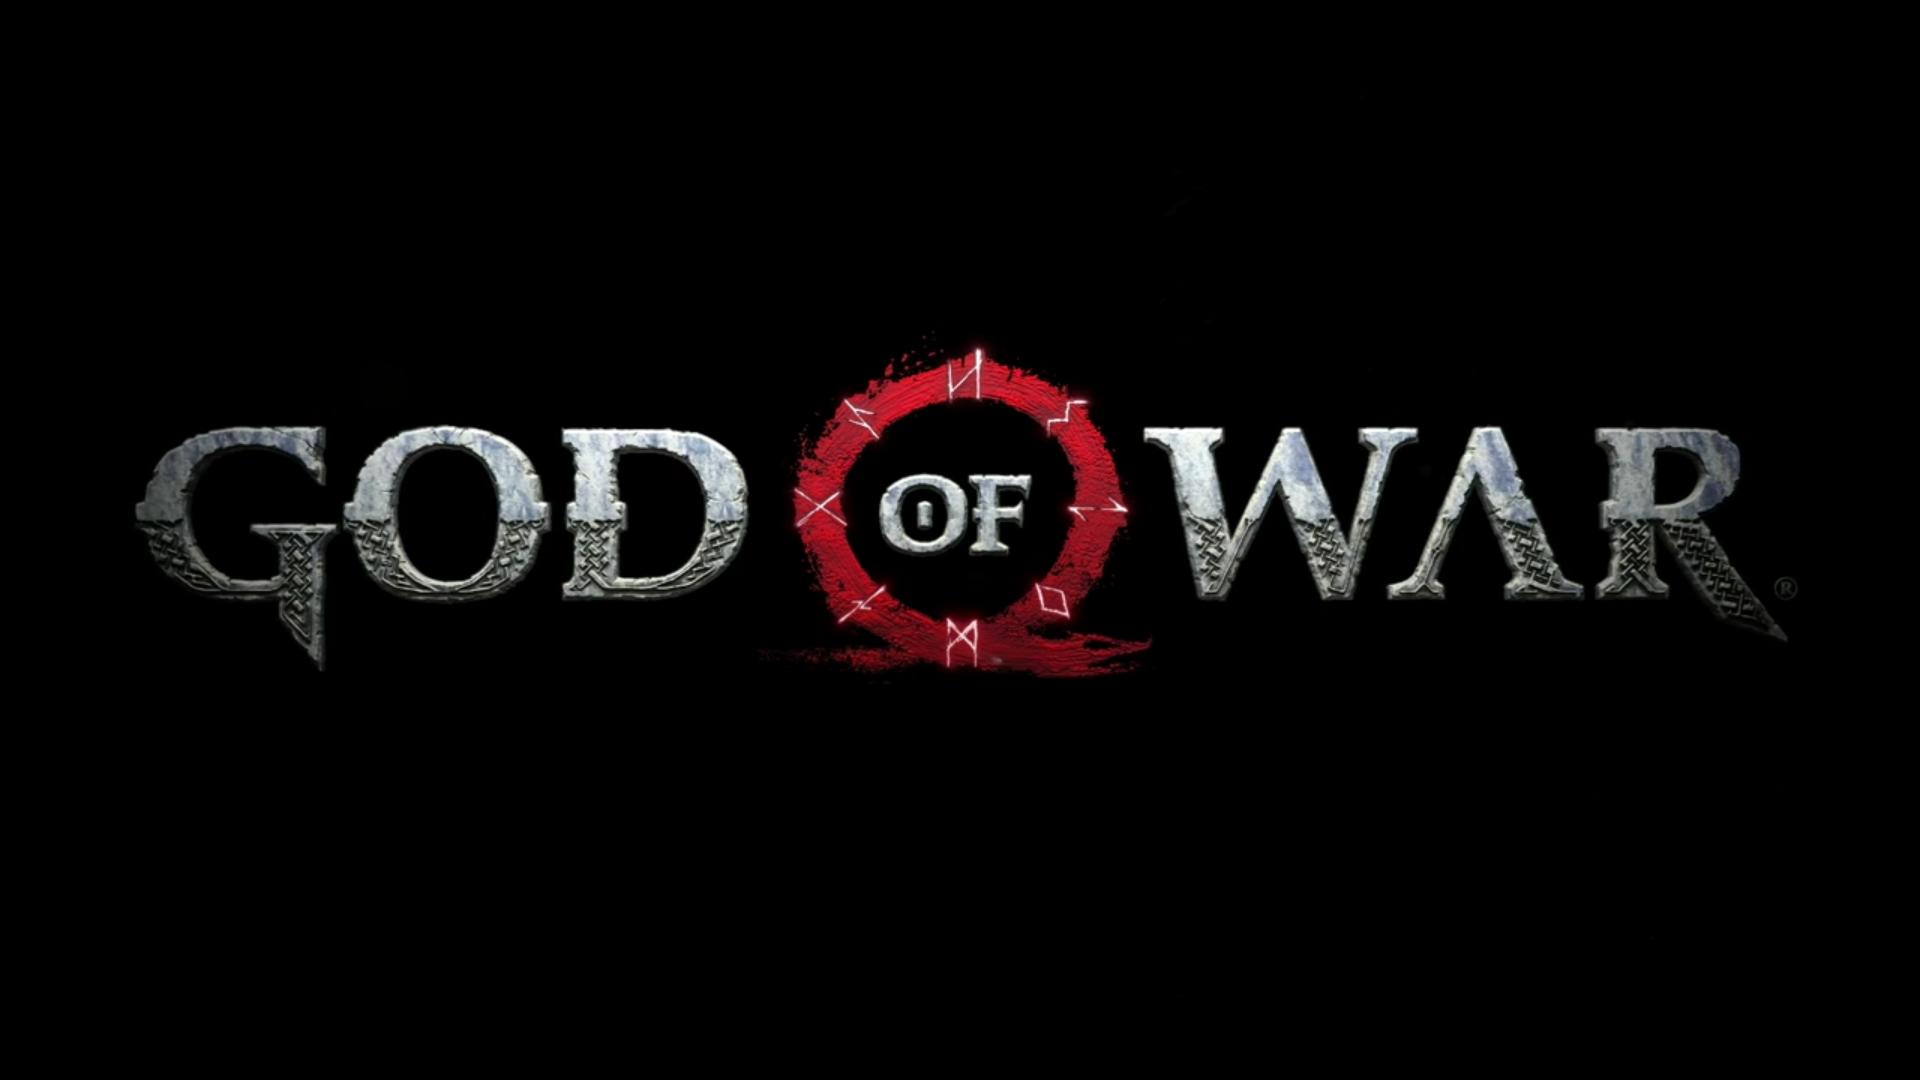 God Of War Logo from the trailer : GodofWar.